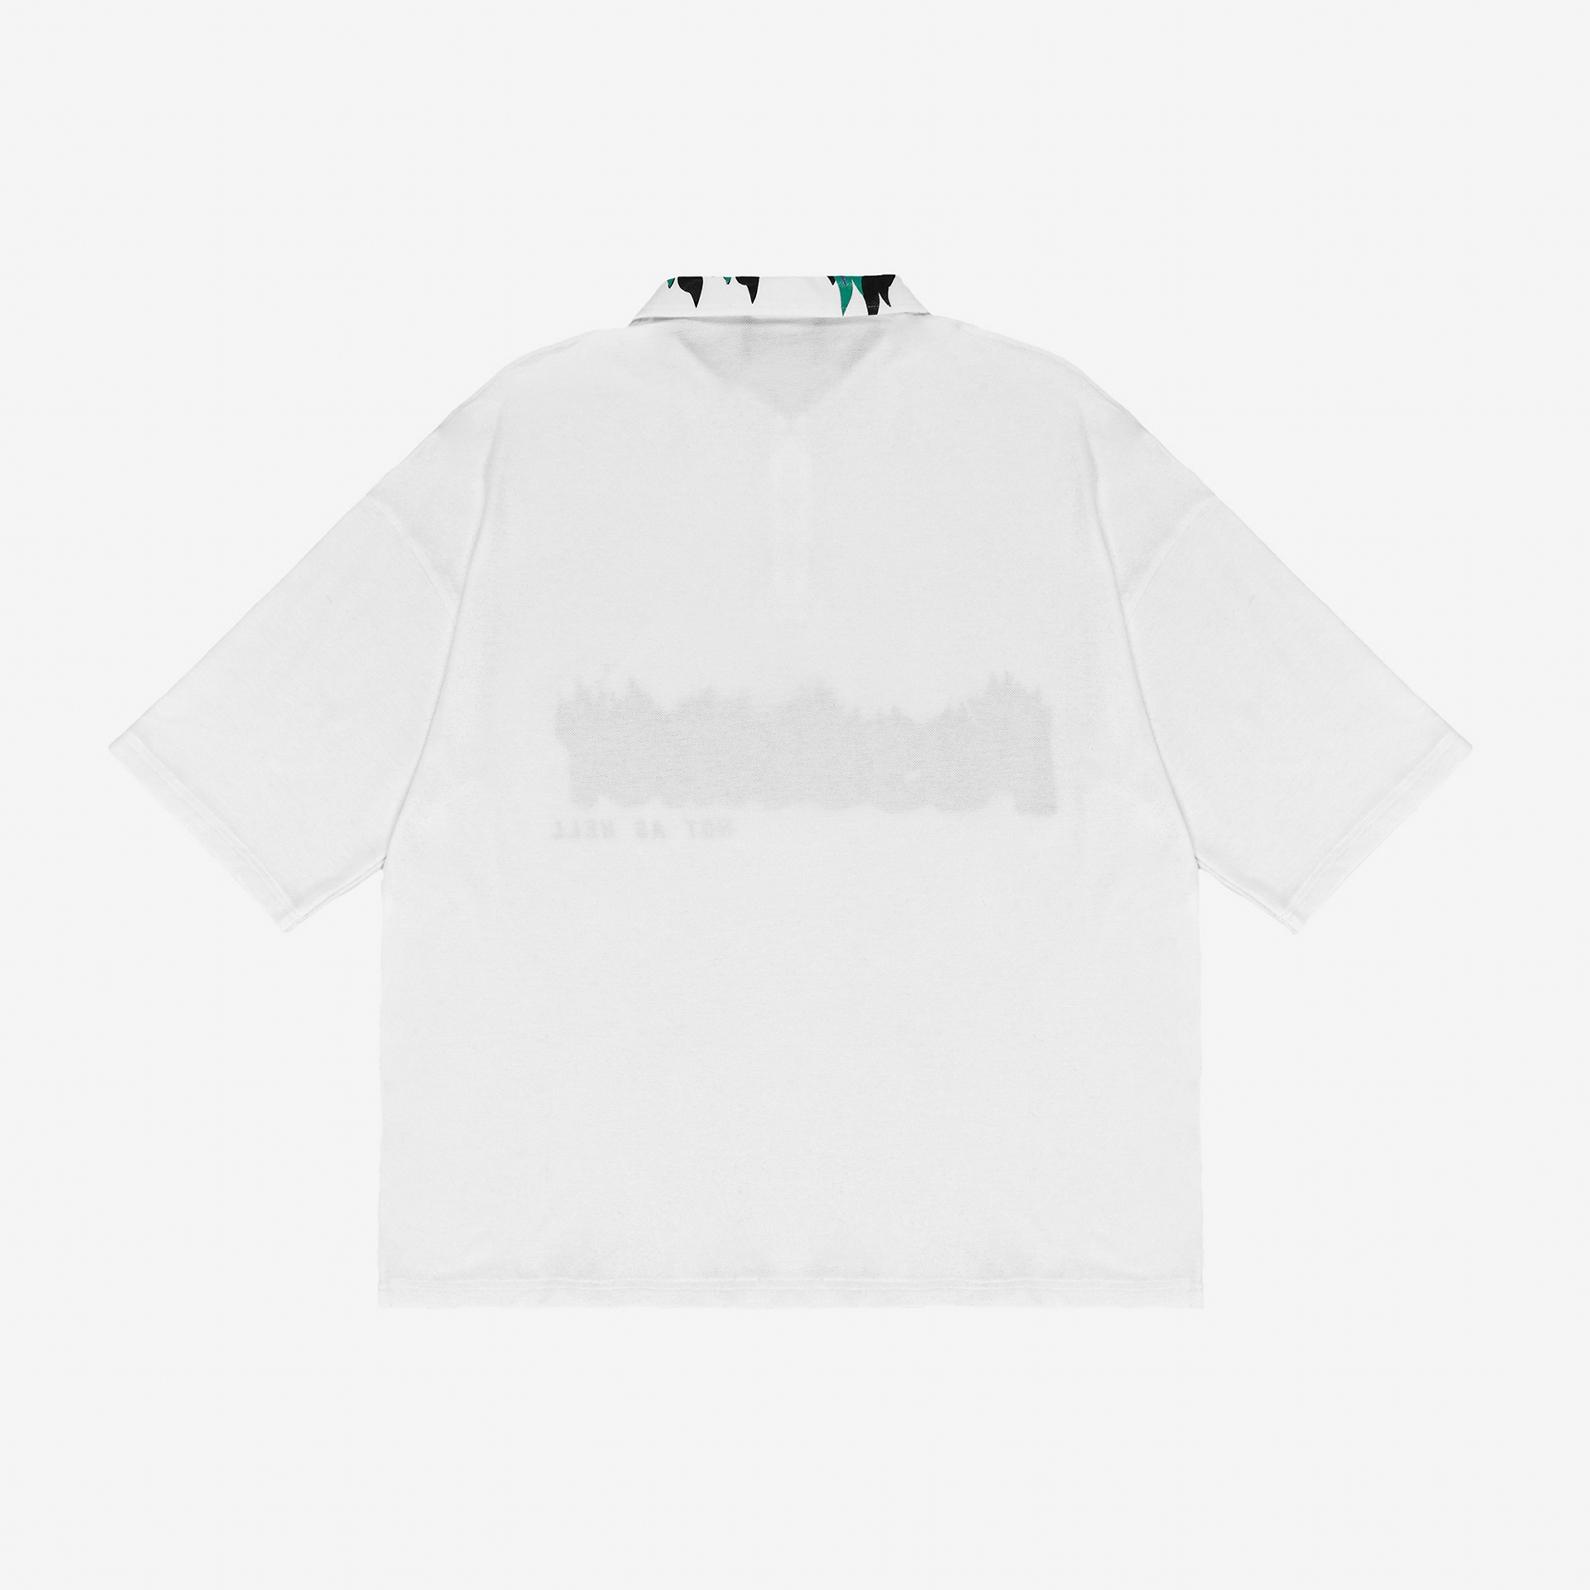 【PAS DE MER/パドゥメ】HOT AS HELL POLO オーバーサイズポロシャツ / WHITE